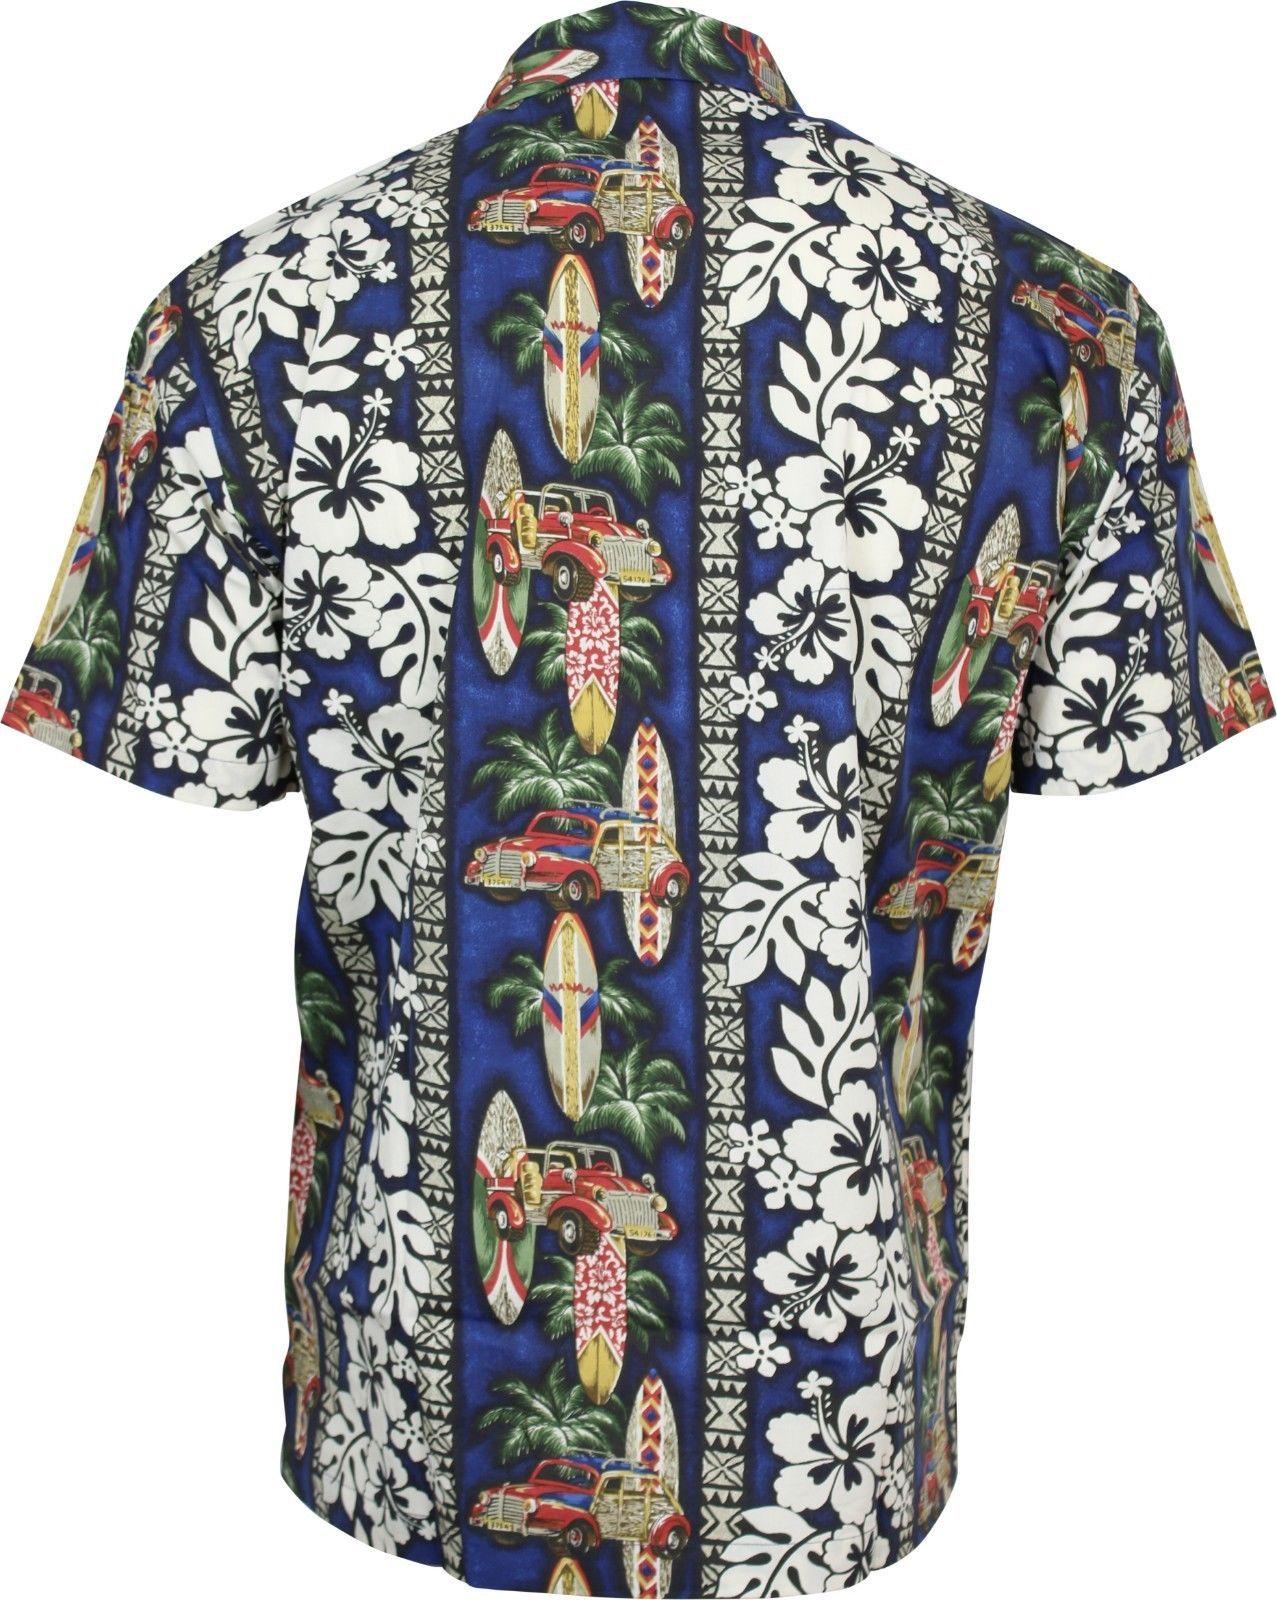 T-Shirt SOFT COATED WEATHEN TERRIER HÖREN AUFS WORT by Siviwonder Unisex